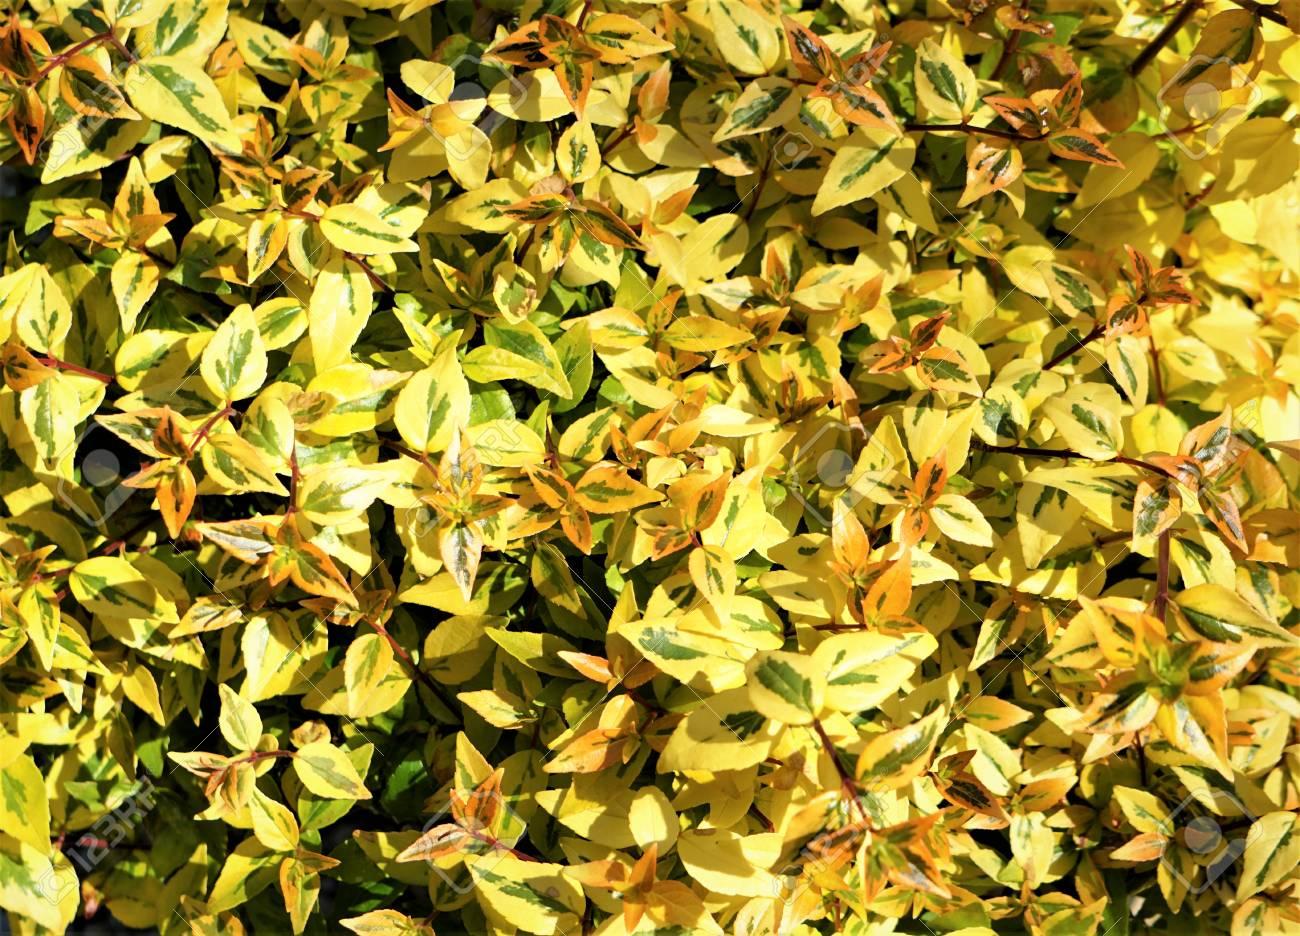 Kaleidoscope Abelia Leaves On The Sunny Day Background Texture